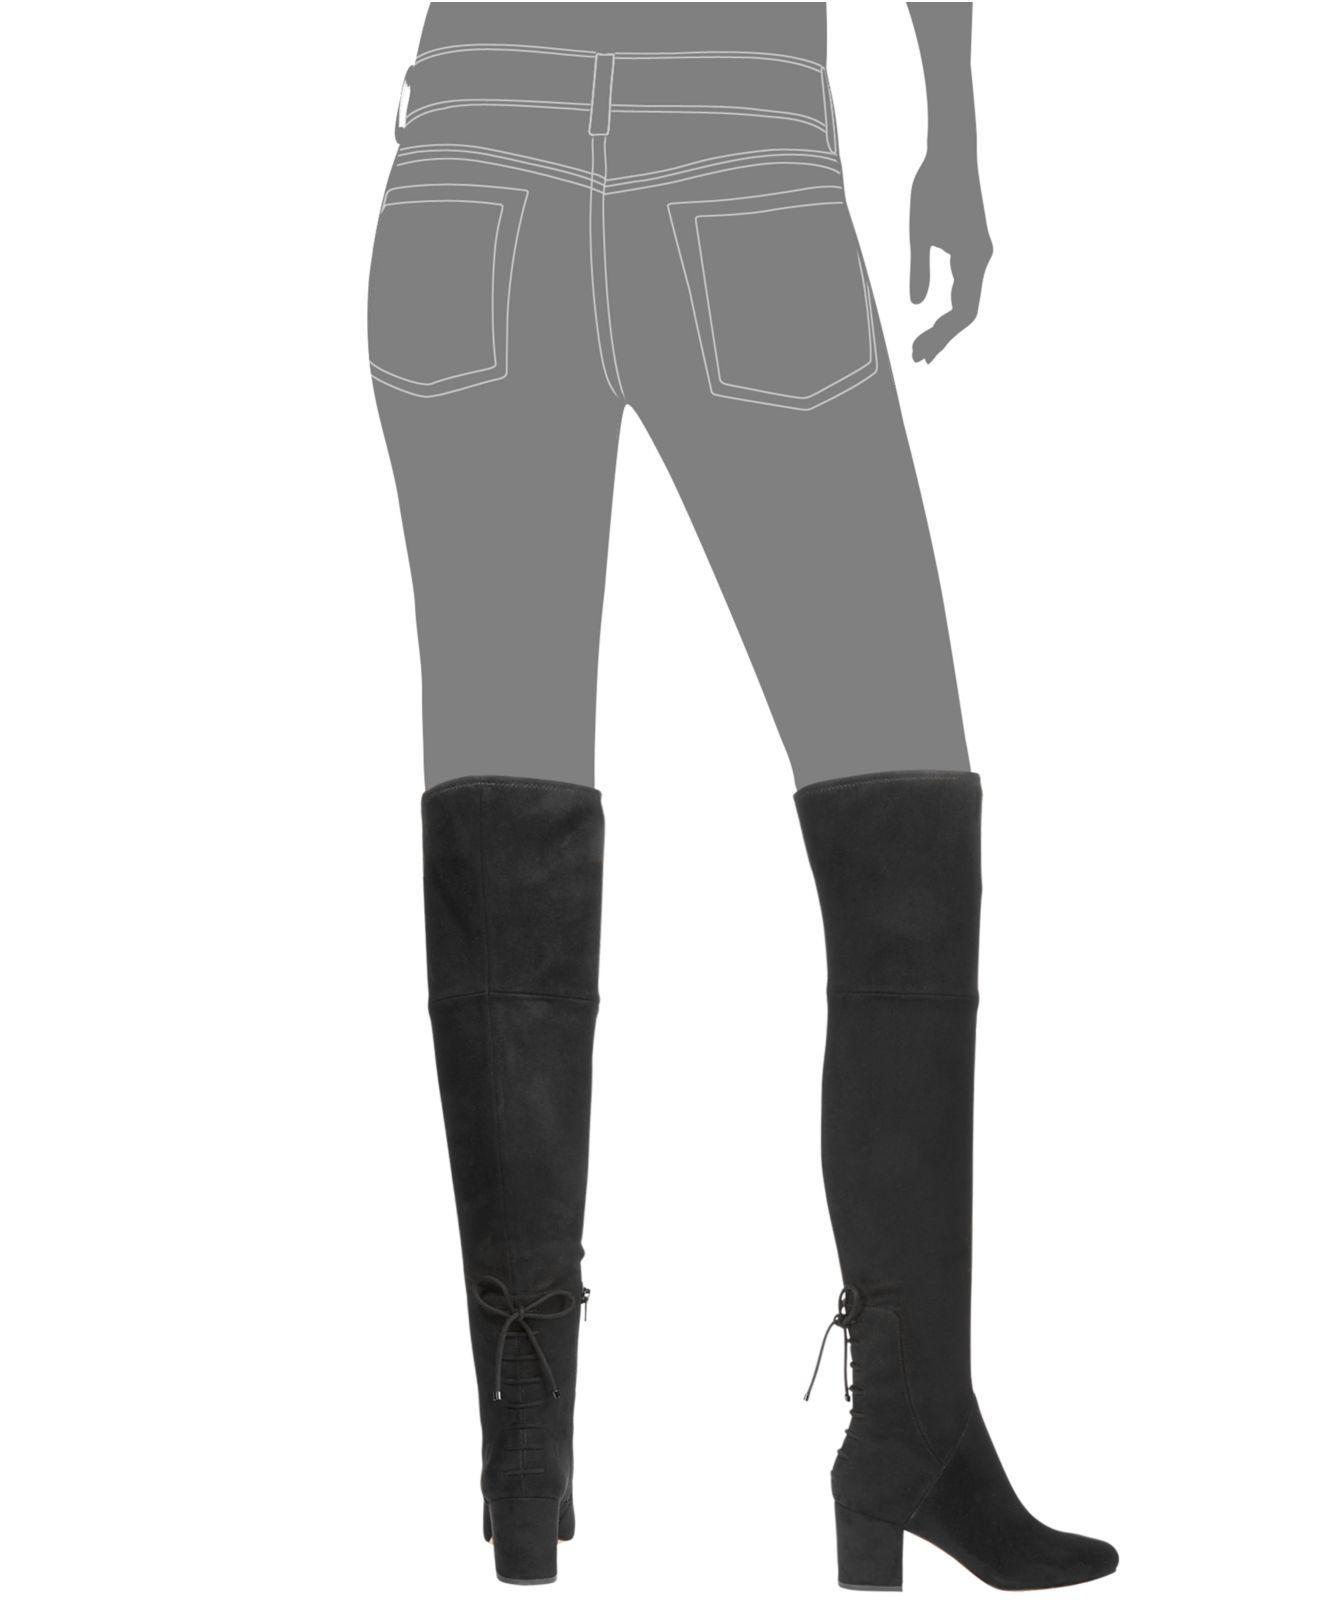 caf84ce2e4f Lyst - ALDO Women s Adessi Over-the-knee Mod Boots in Black